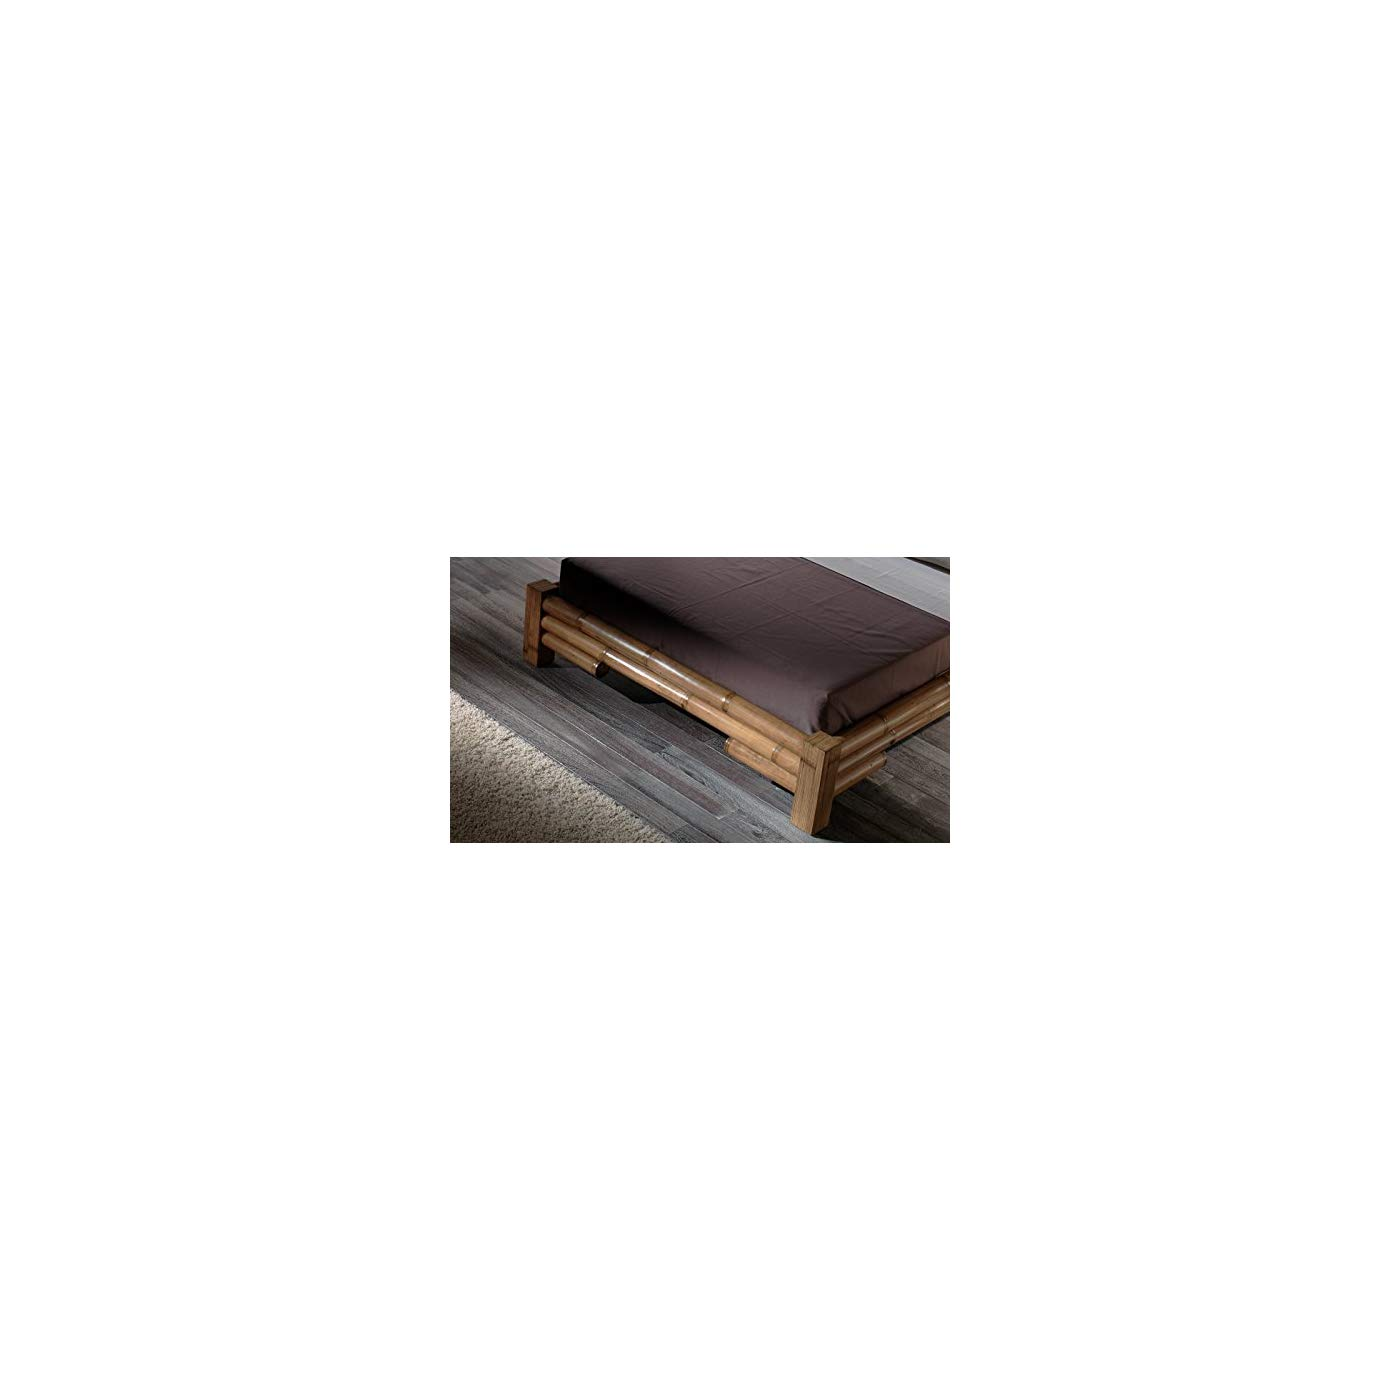 Full Size of Bambus Bett 220 X Mit Stauraum 160x200 140x200 Weiß Breit Dänisches Bettenlager Badezimmer Meise Betten Aus Holz Schubladen Weisses Even Better Clinique Bett Bambus Bett